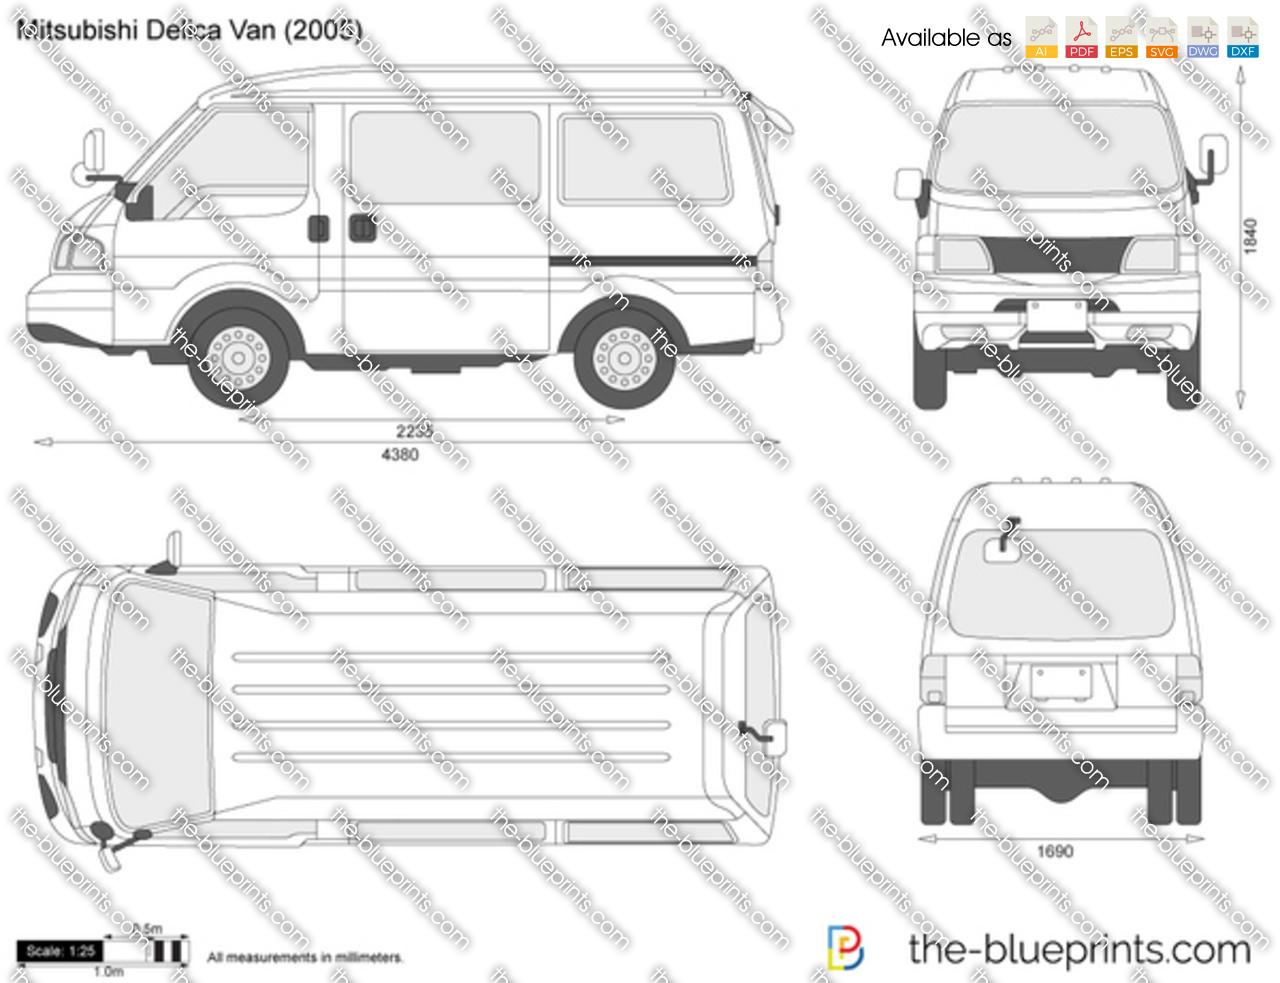 Mitsubishi Delica Van 2008